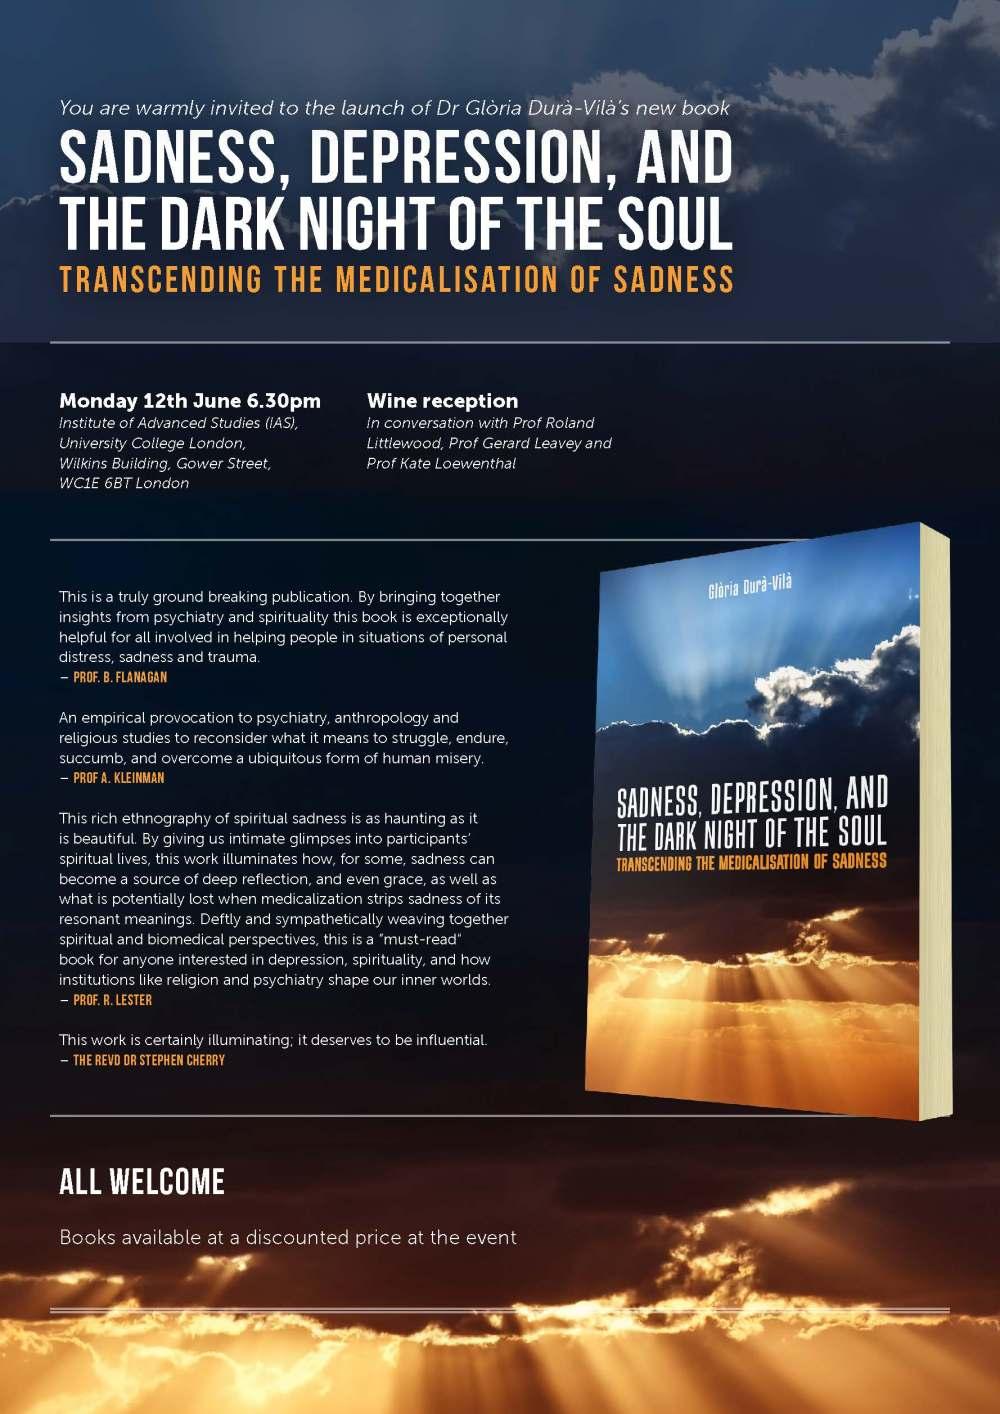 ias_book_launch_flyer